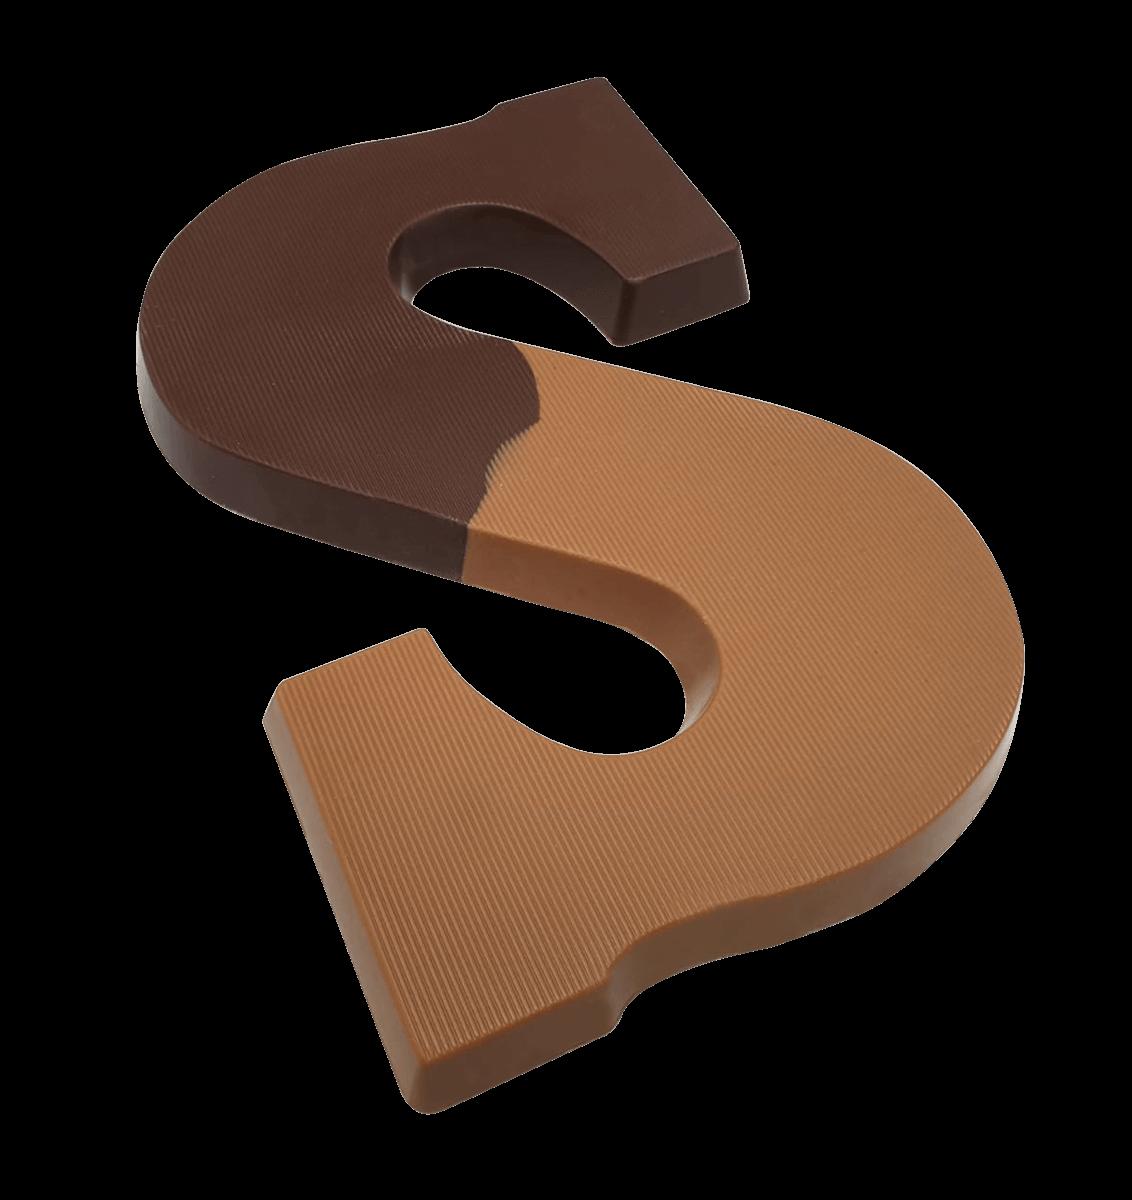 Chocoladeletter 220 gram DUO MELK & PUUR